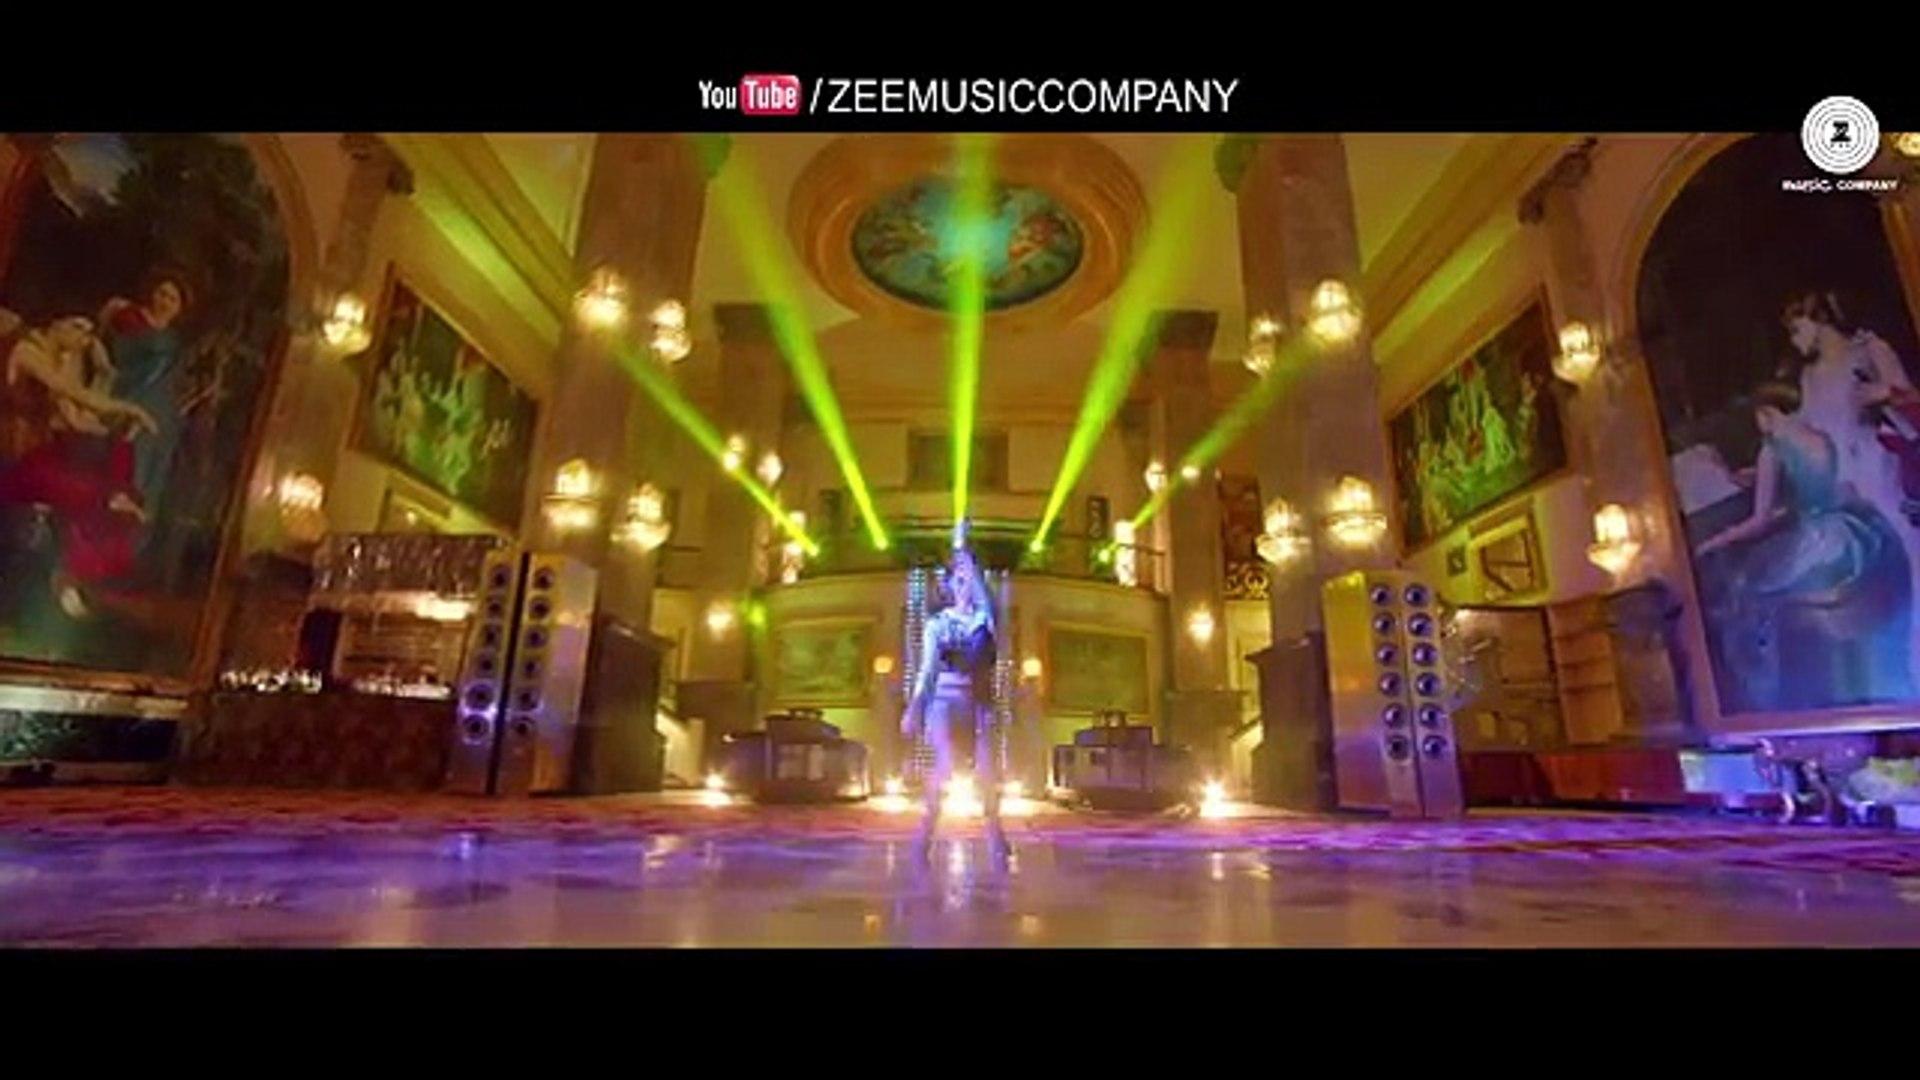 Baby Marvake Maanegi - Raftaar  Nora Fatehi  Remo D'souza  India's first DANCEHALL Song